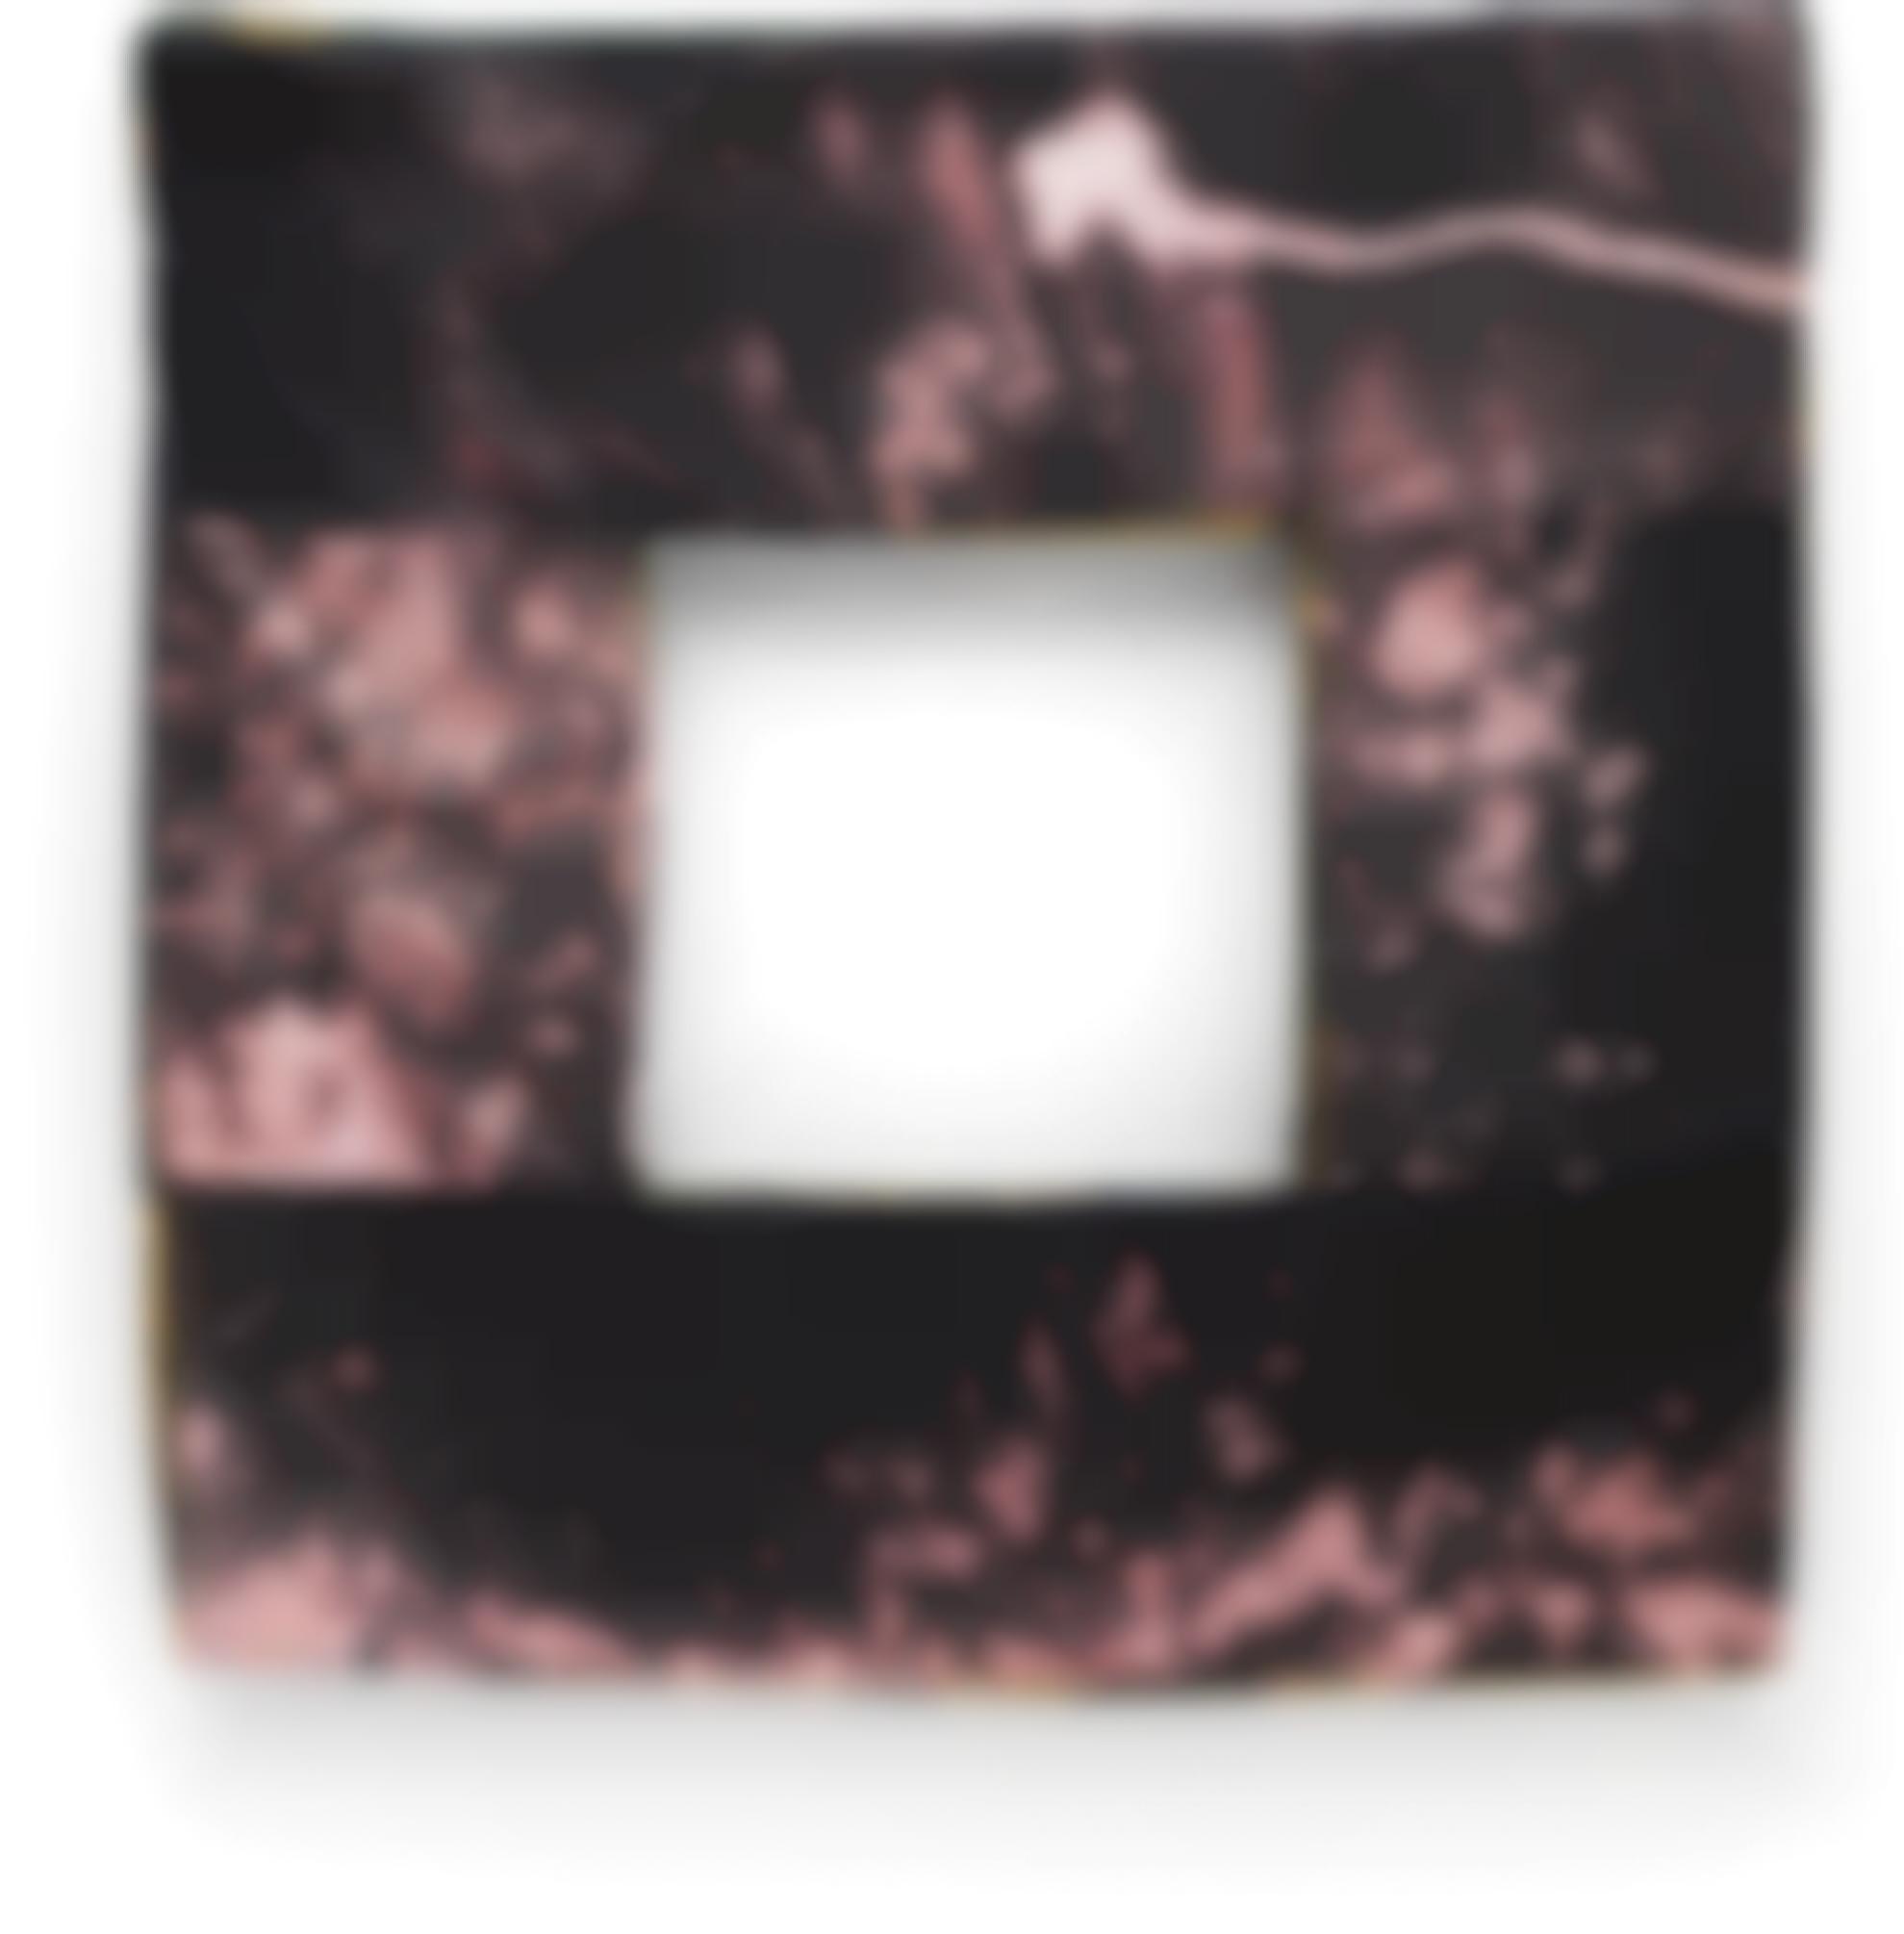 Sterling Ruby-Soft Vortex-2007